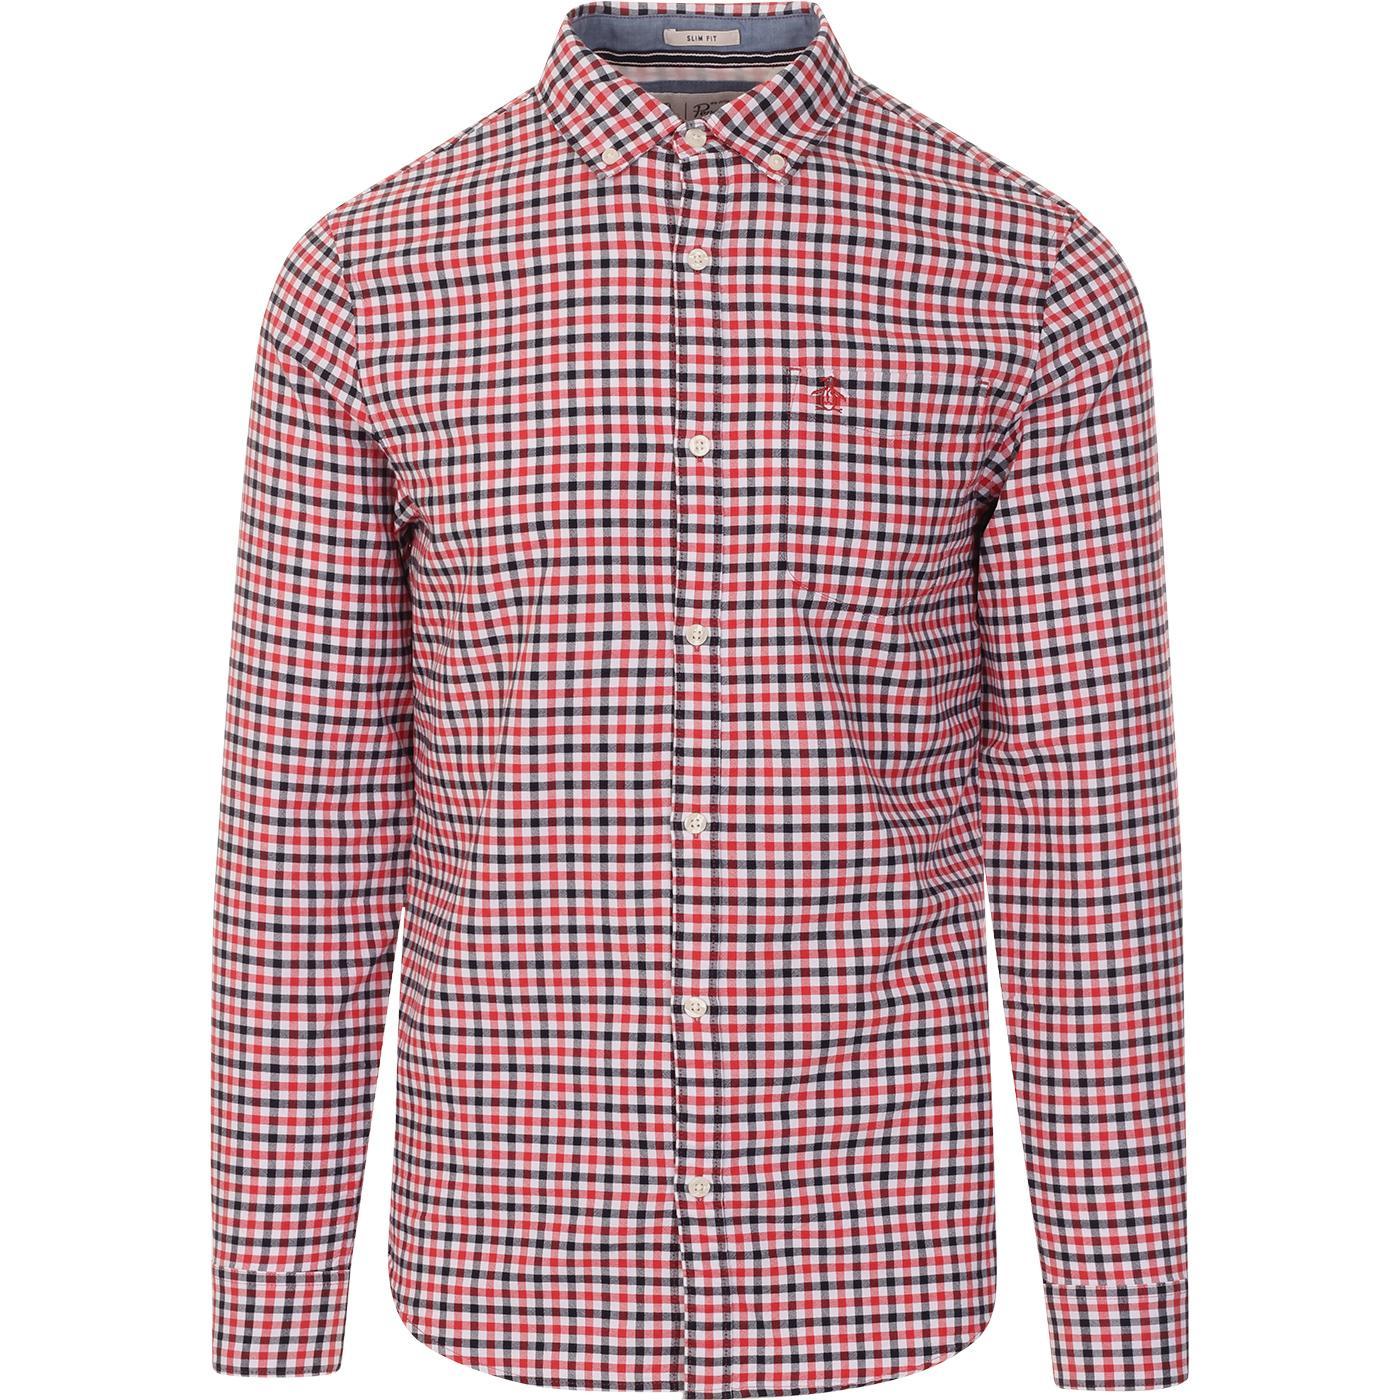 ORIGINAL PENGUIN Mod BD Oxford Gingham Shirt (CR)